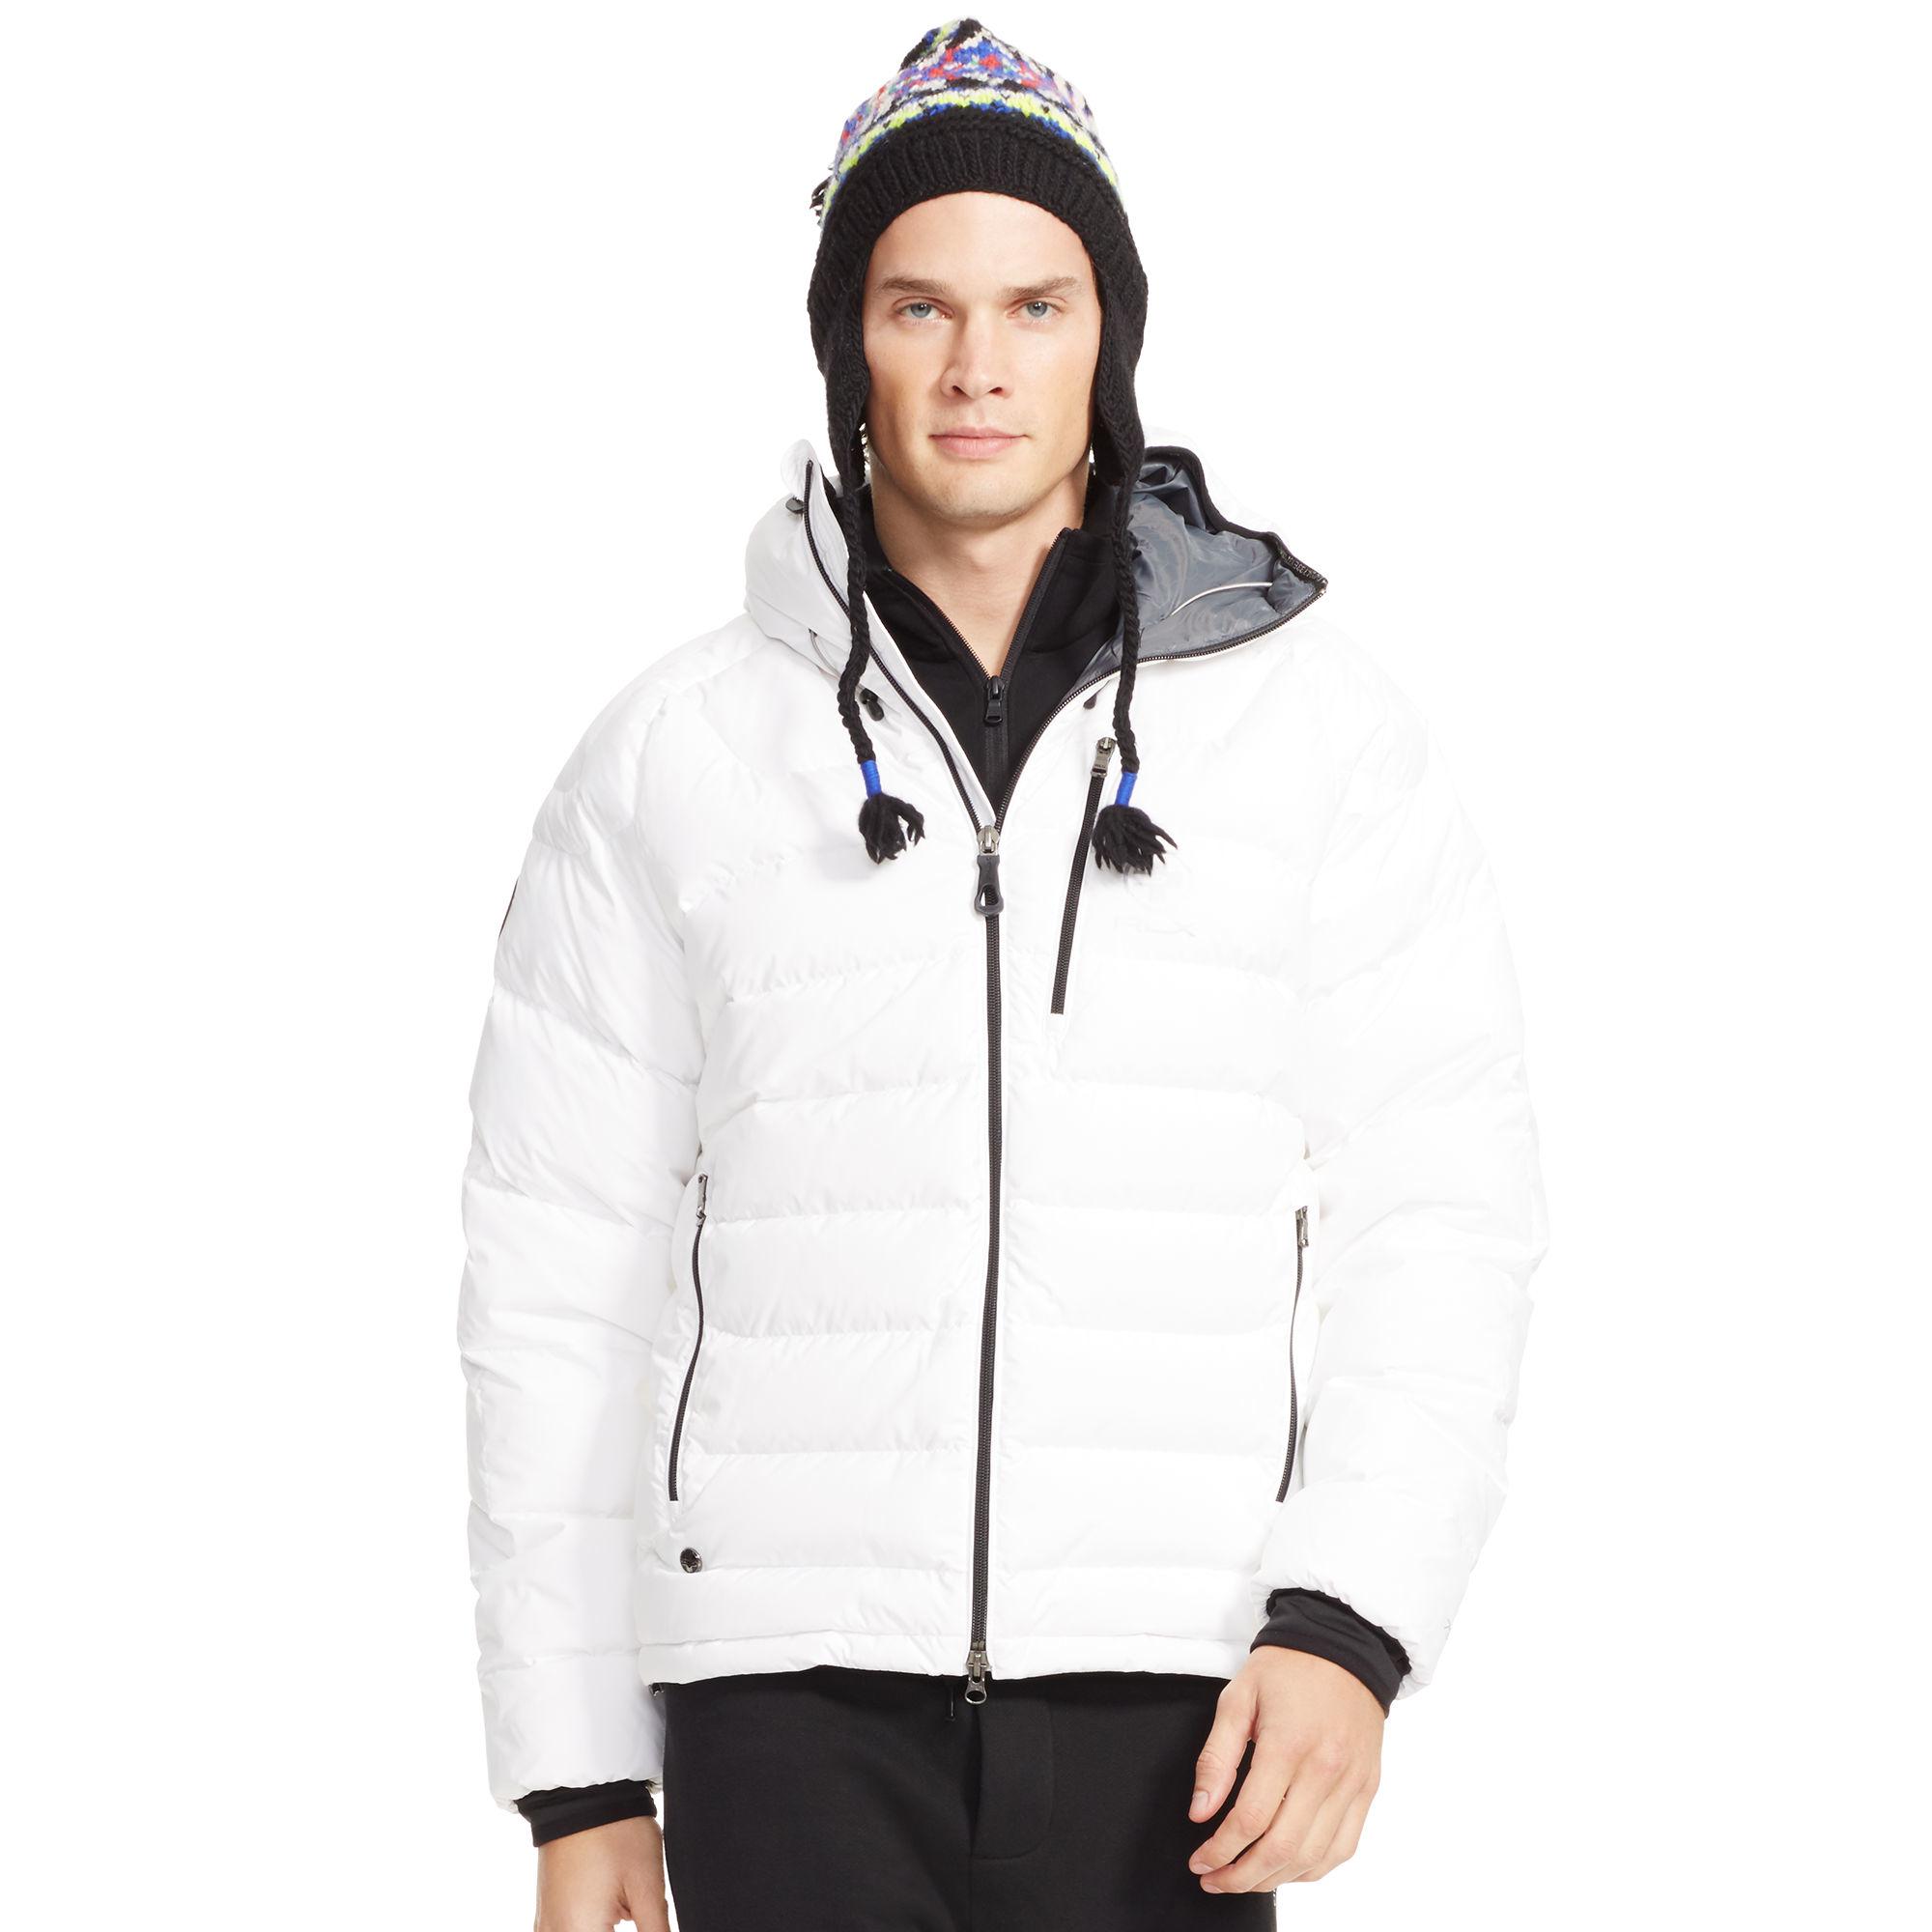 ffeafbfd Polo Ralph Lauren Water-repellent Down Jacket in White for Men - Lyst